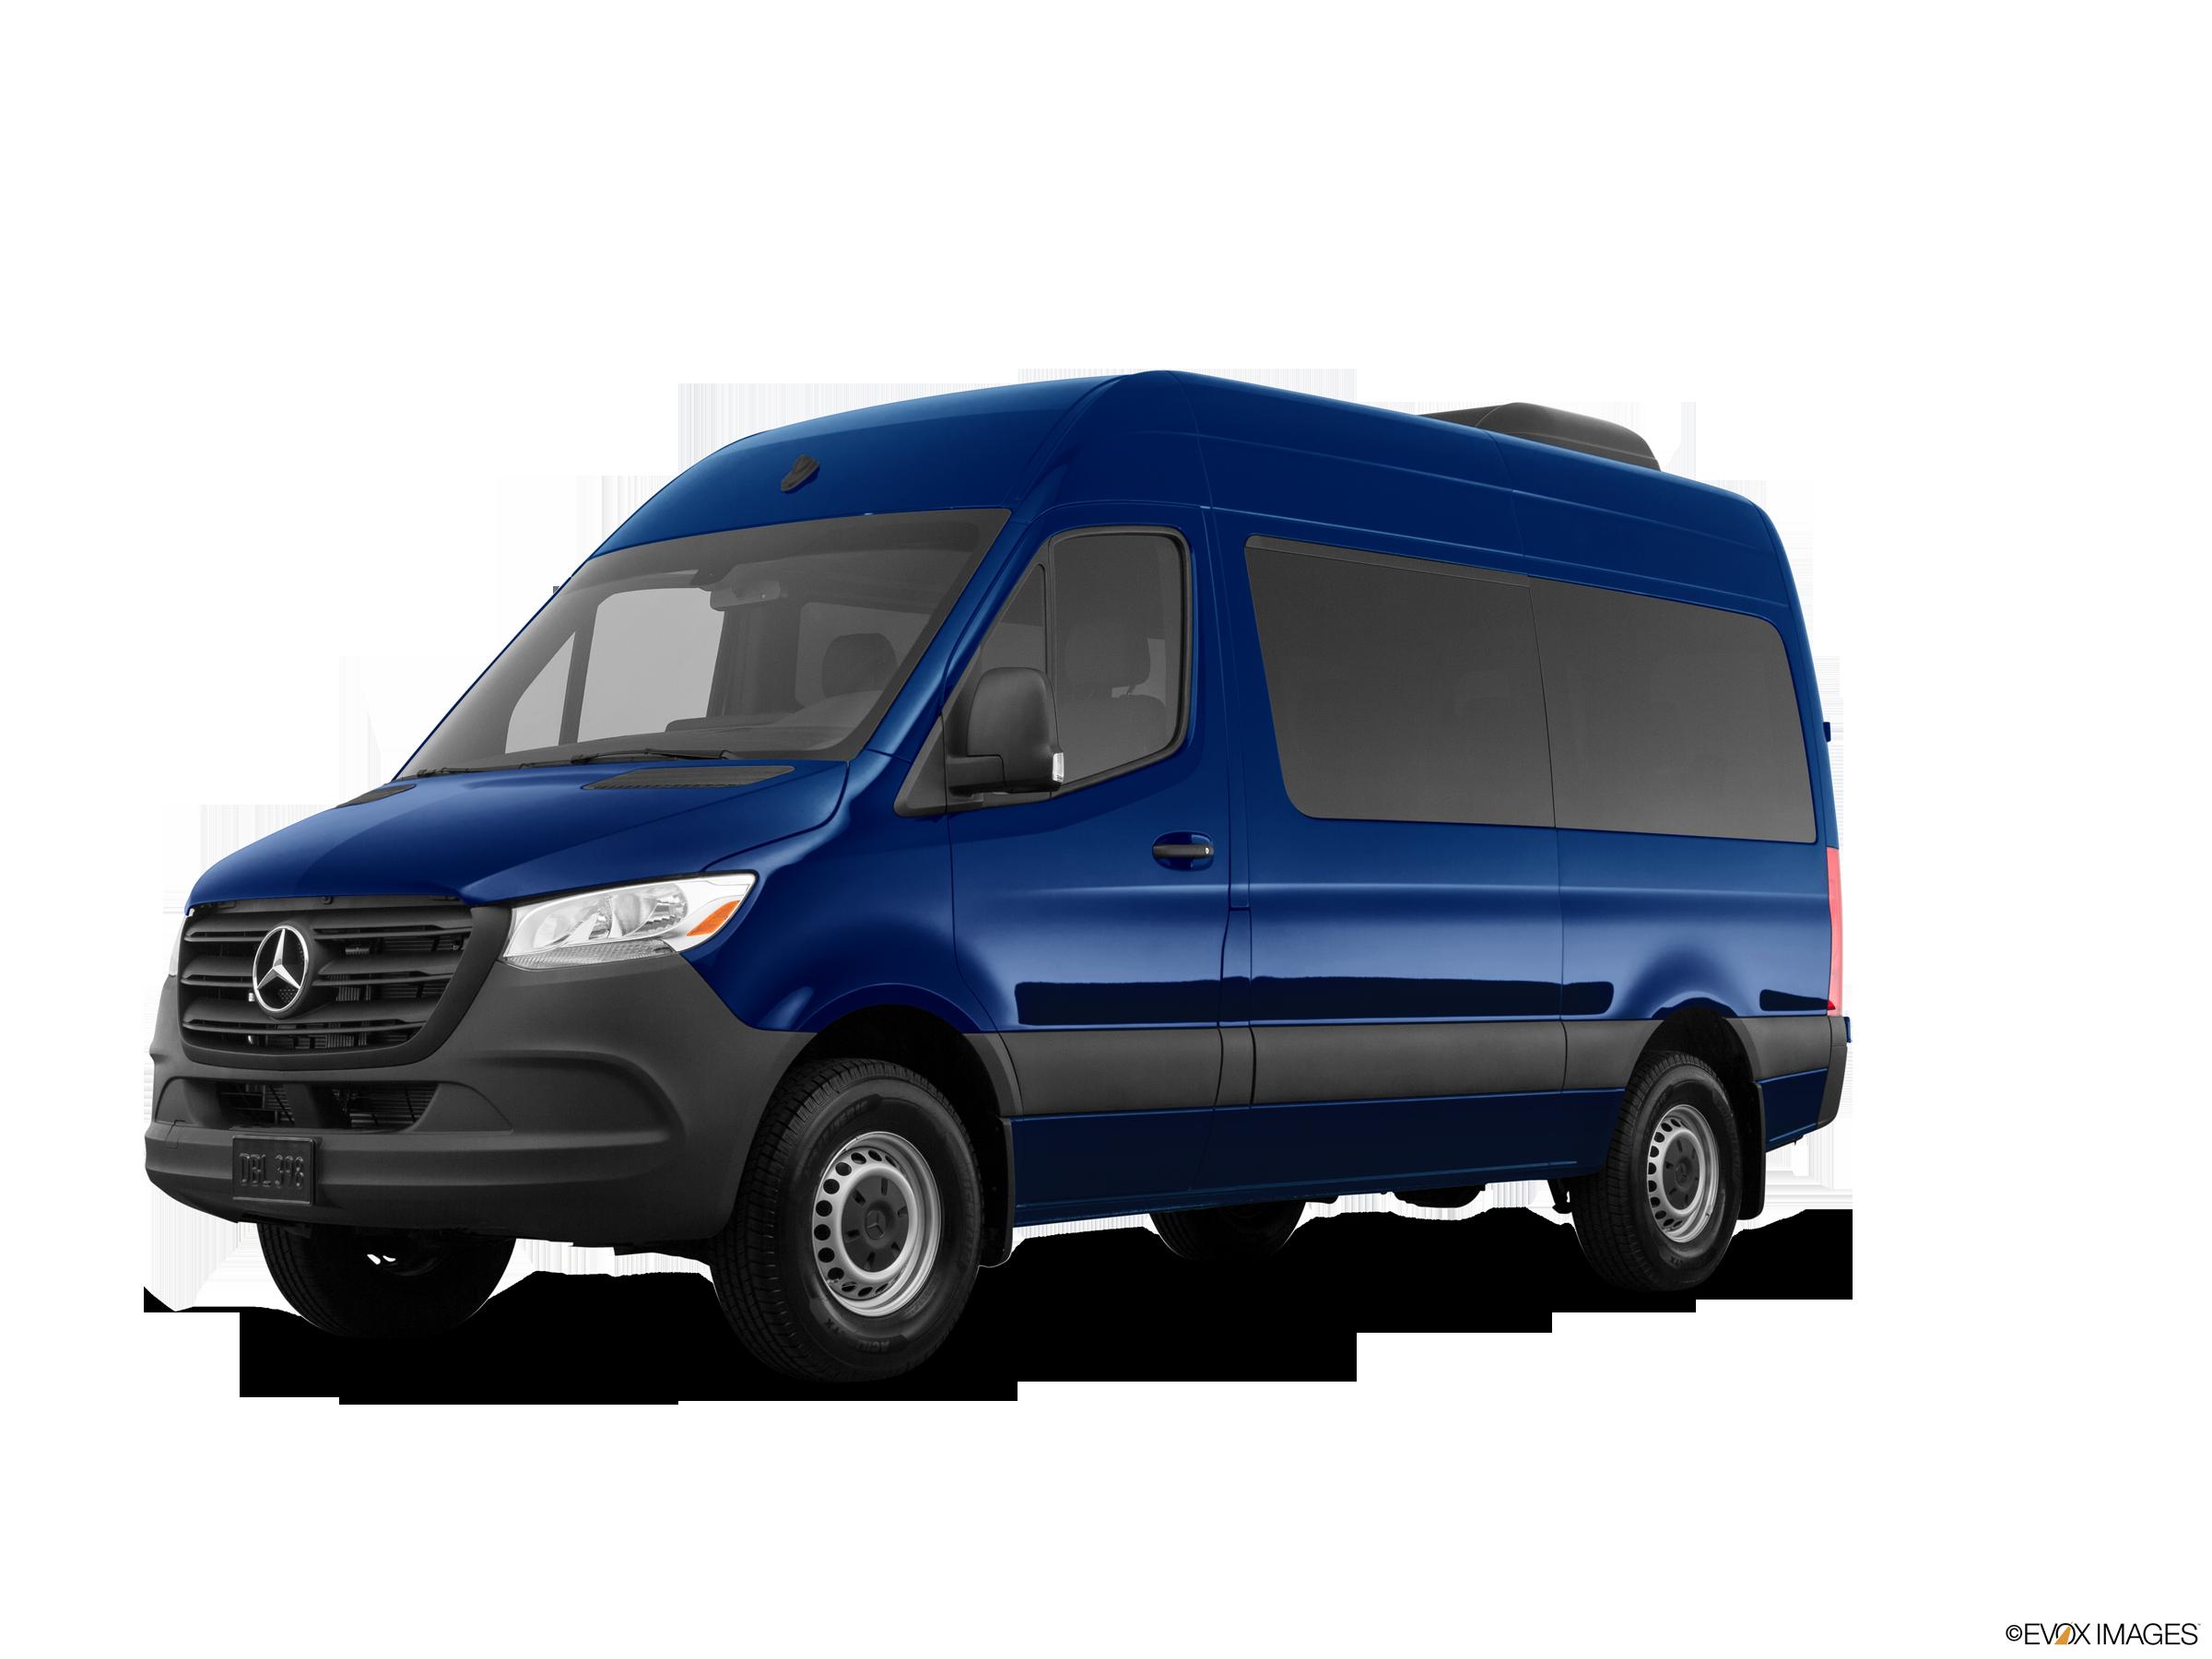 AIS125 Ambulance, Patient Transport Vehicle, Life Support